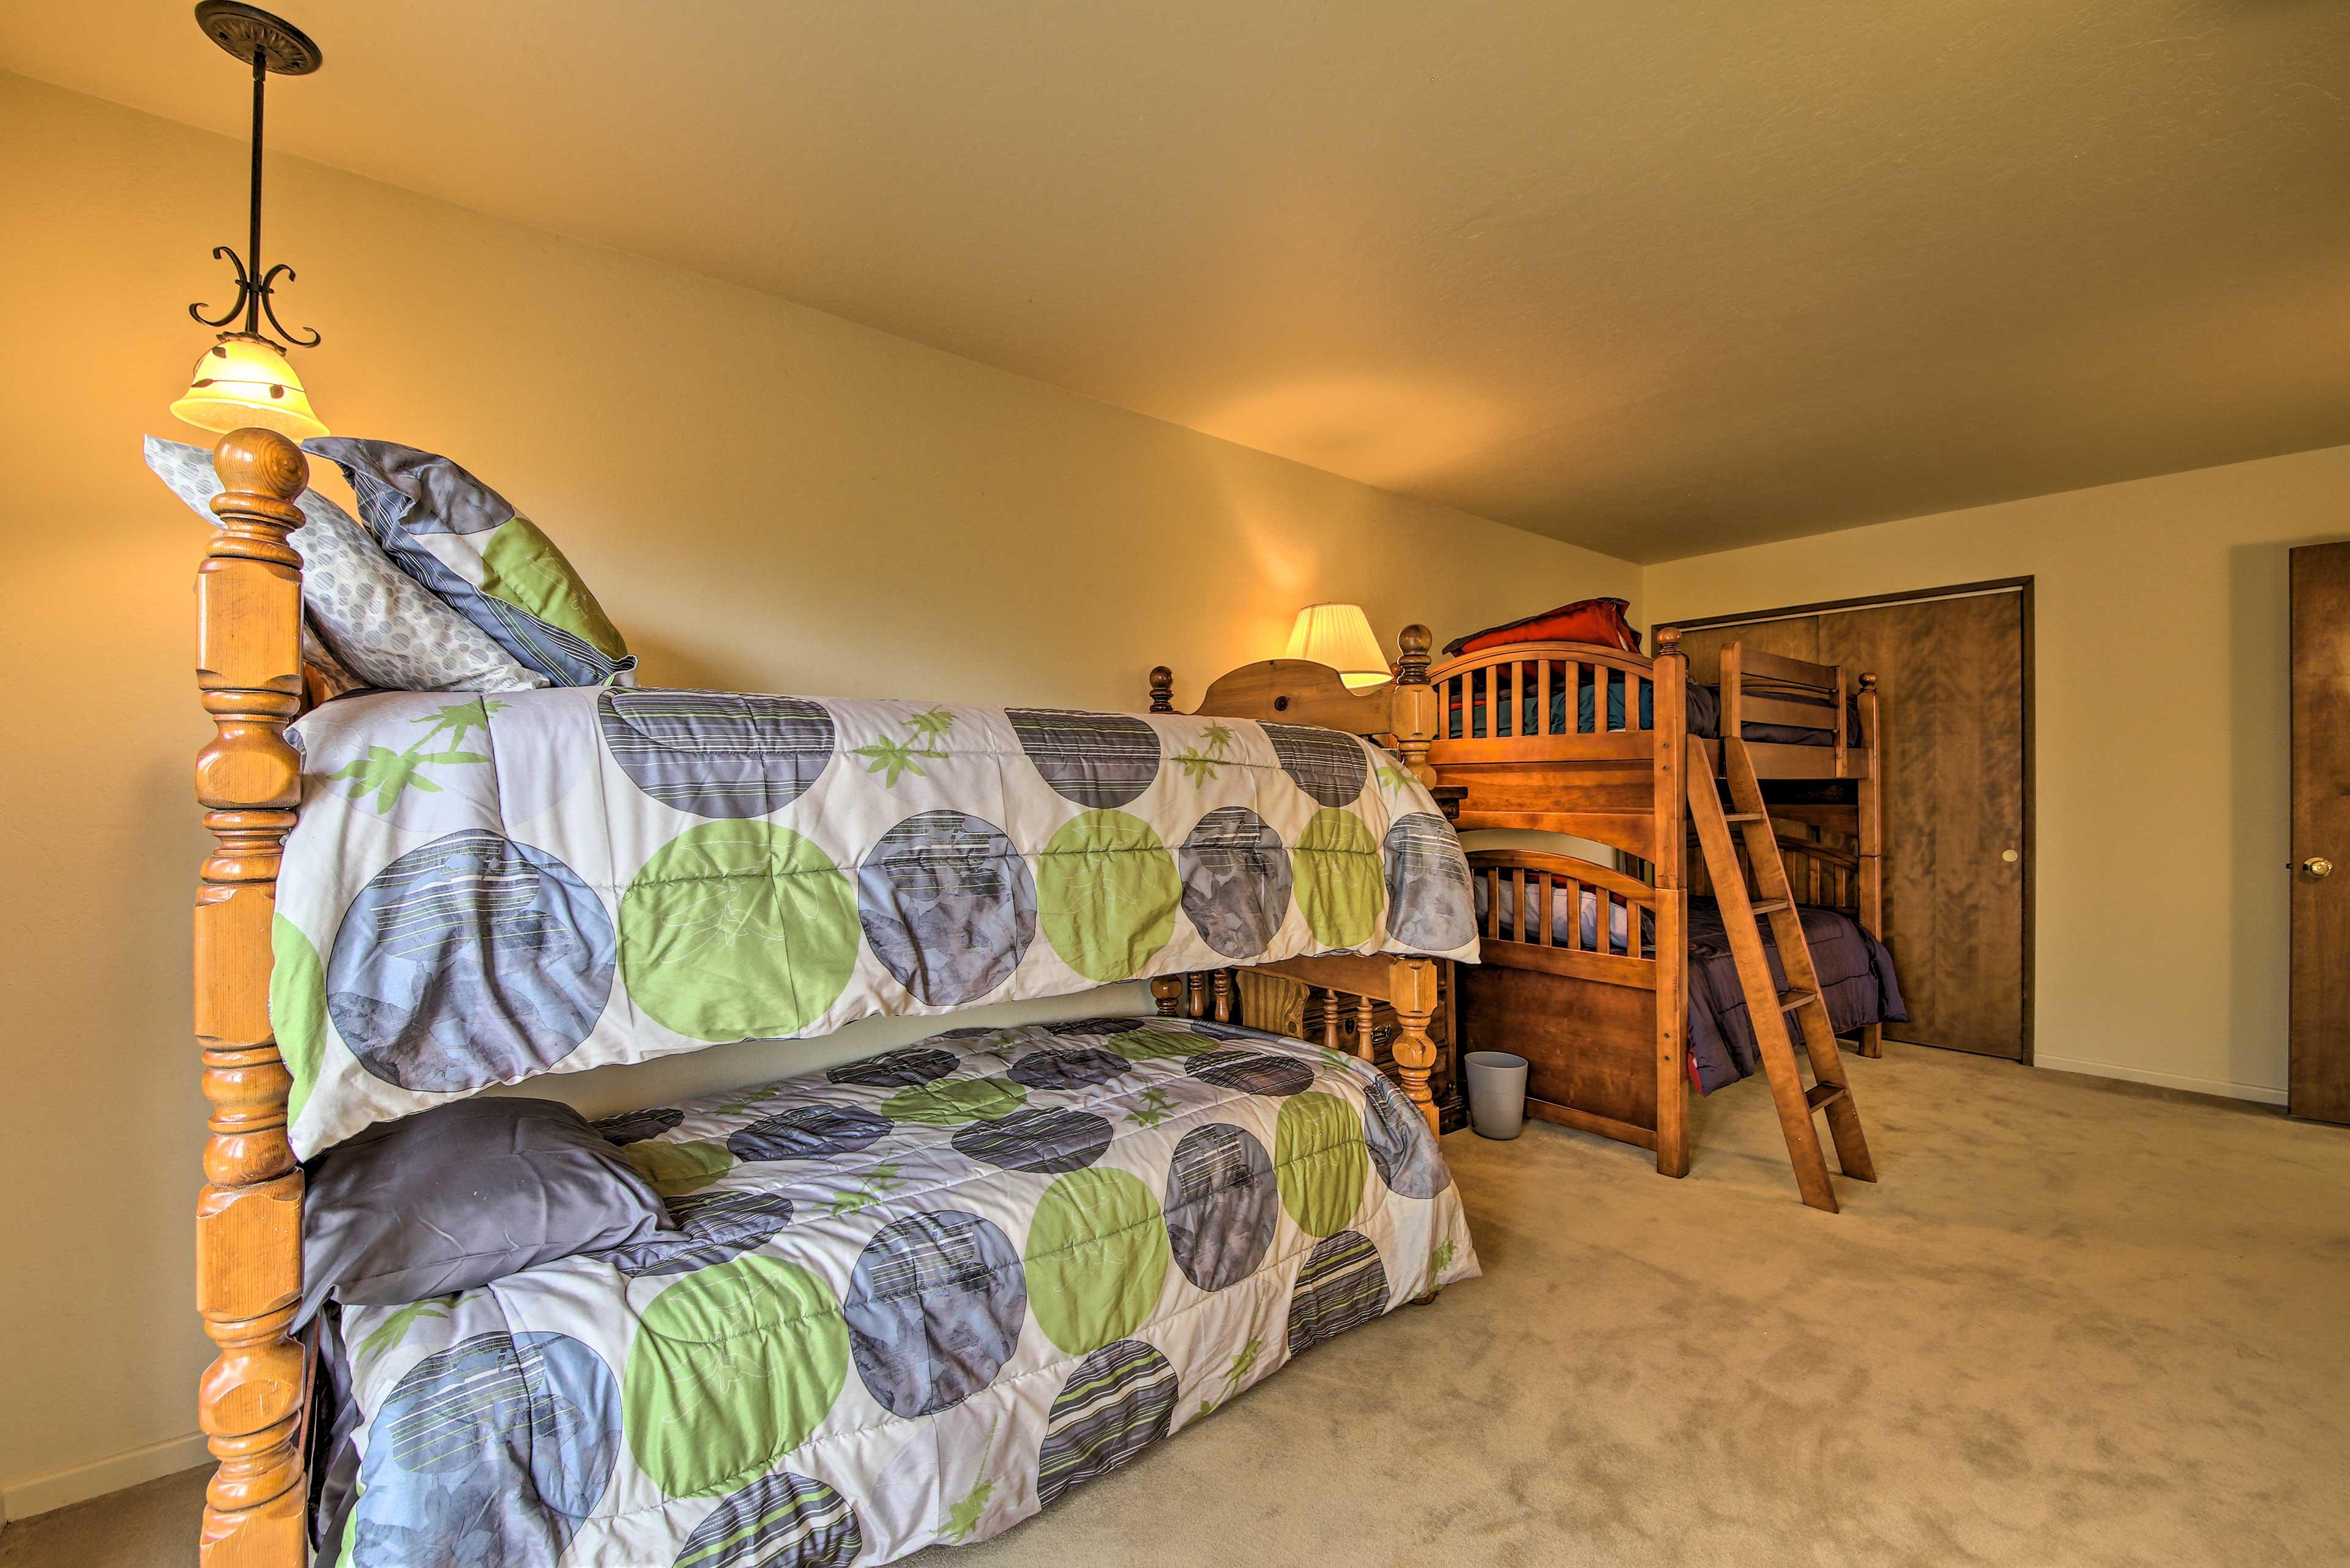 Have the kids sleep in bedroom 5.